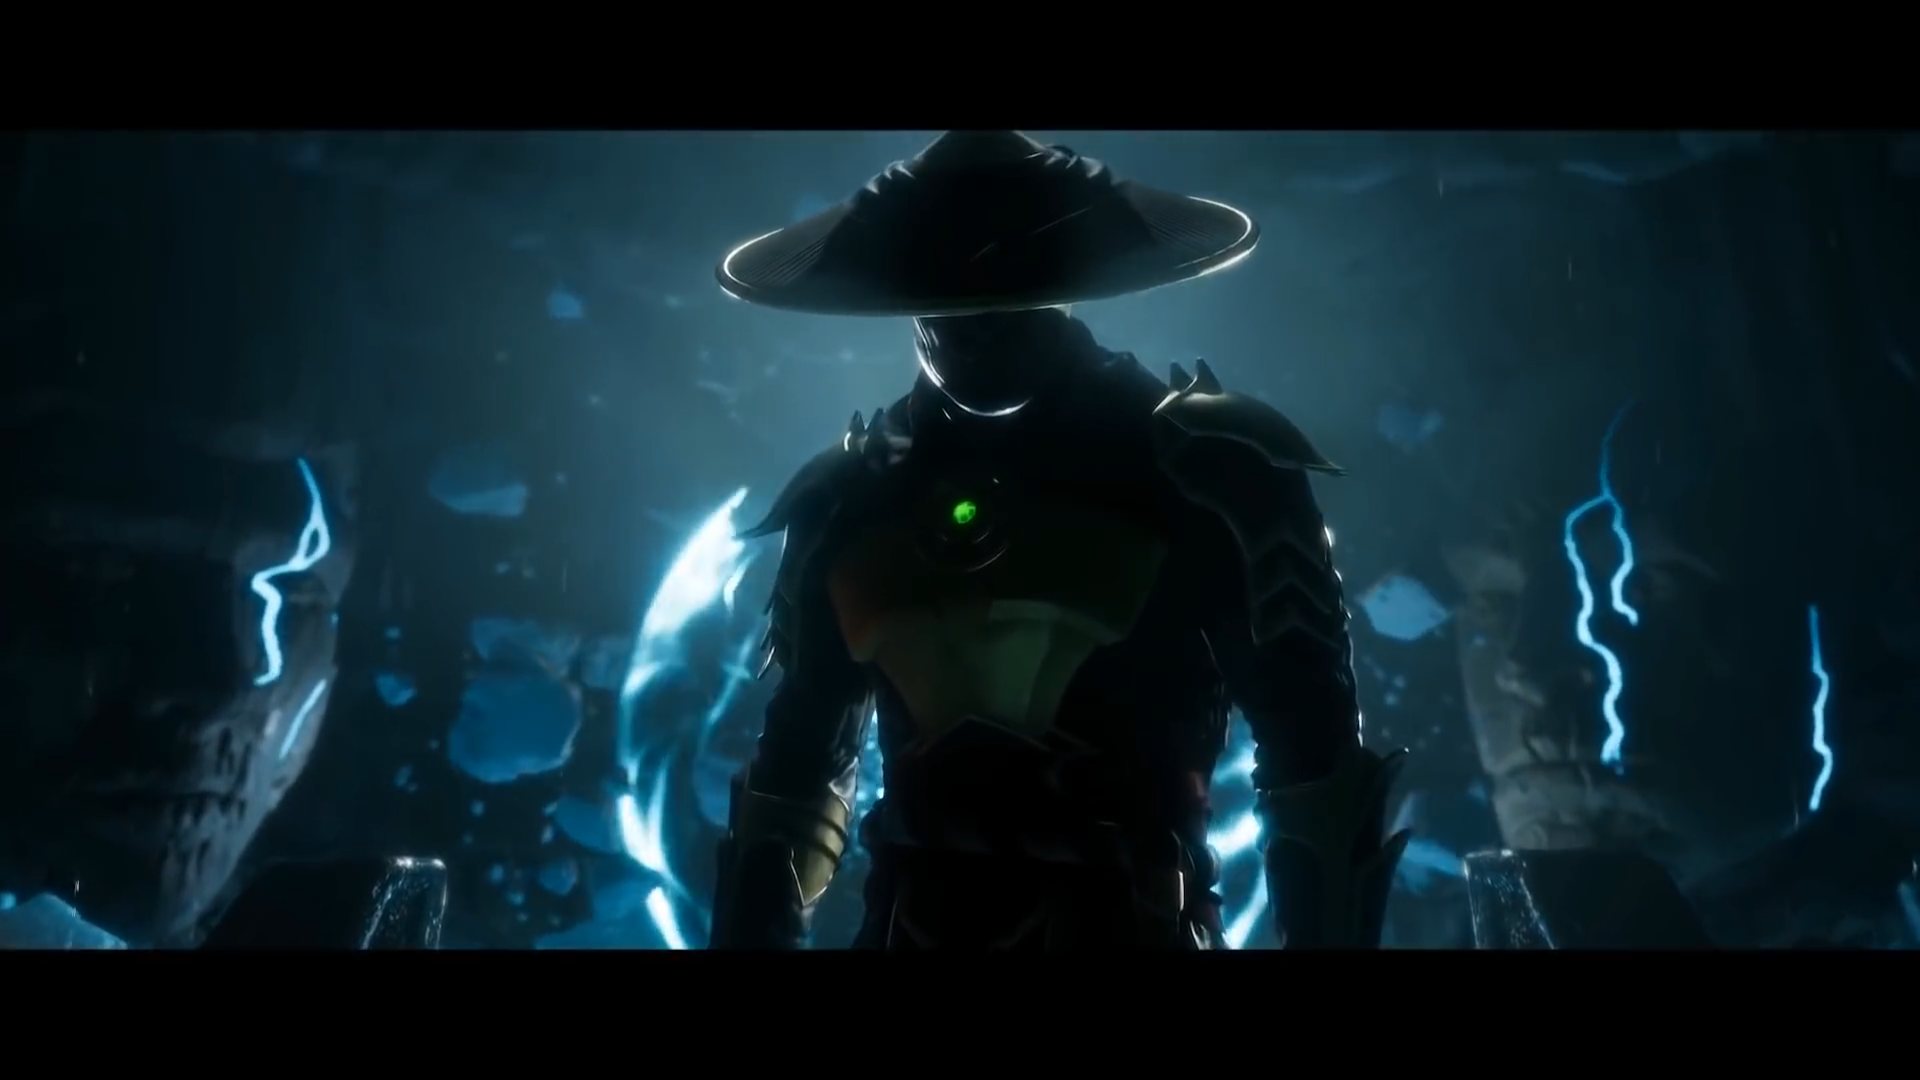 IMG_20190121_193141.002.jpg - Mortal Kombat 11